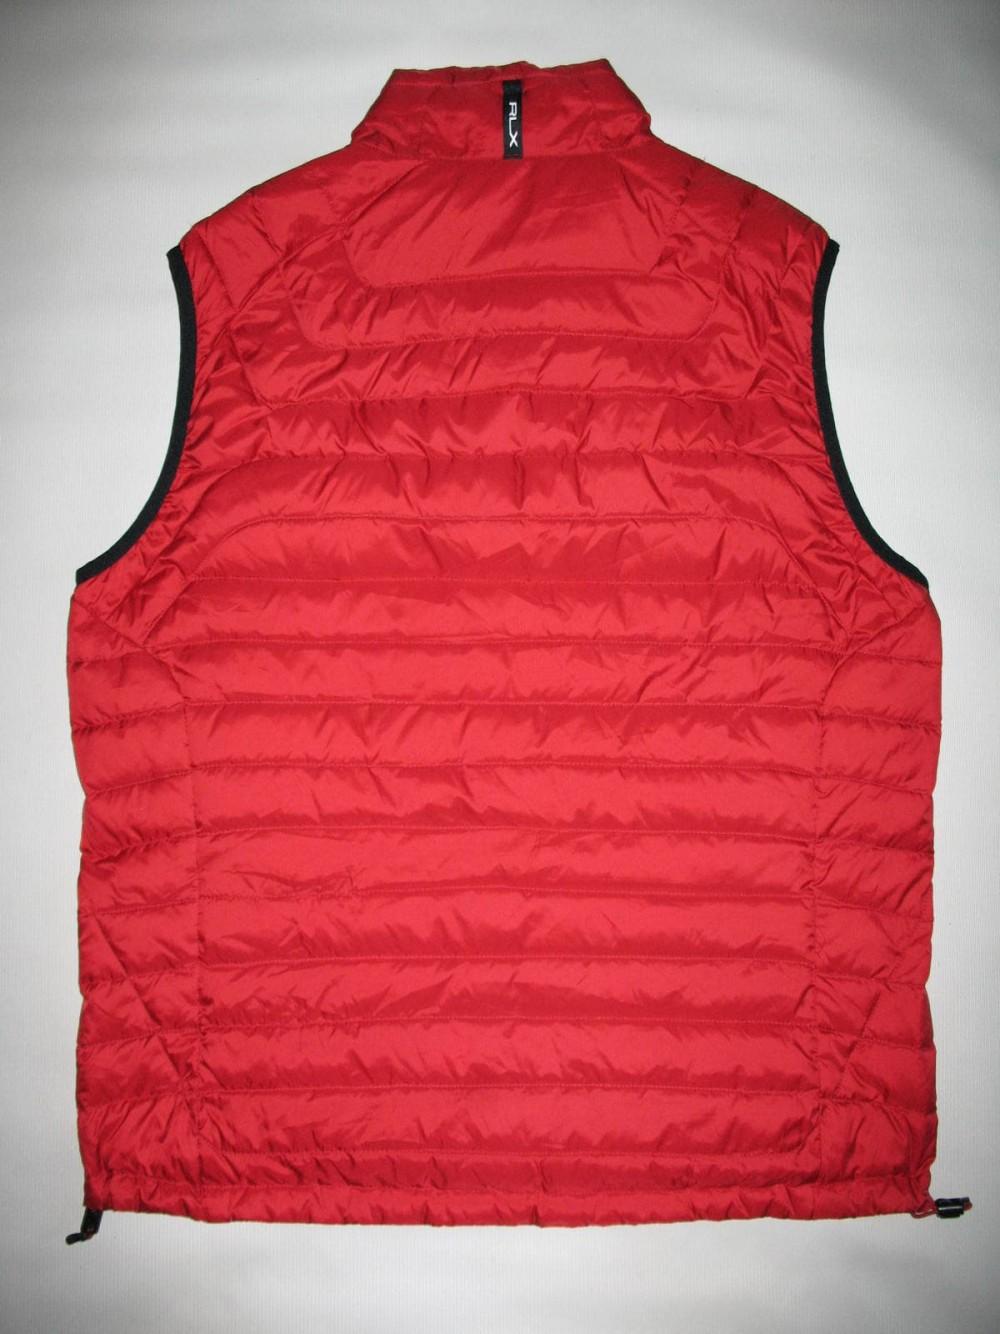 Жилет RLX RALPH LAUREN  down vest (размер L) - 1